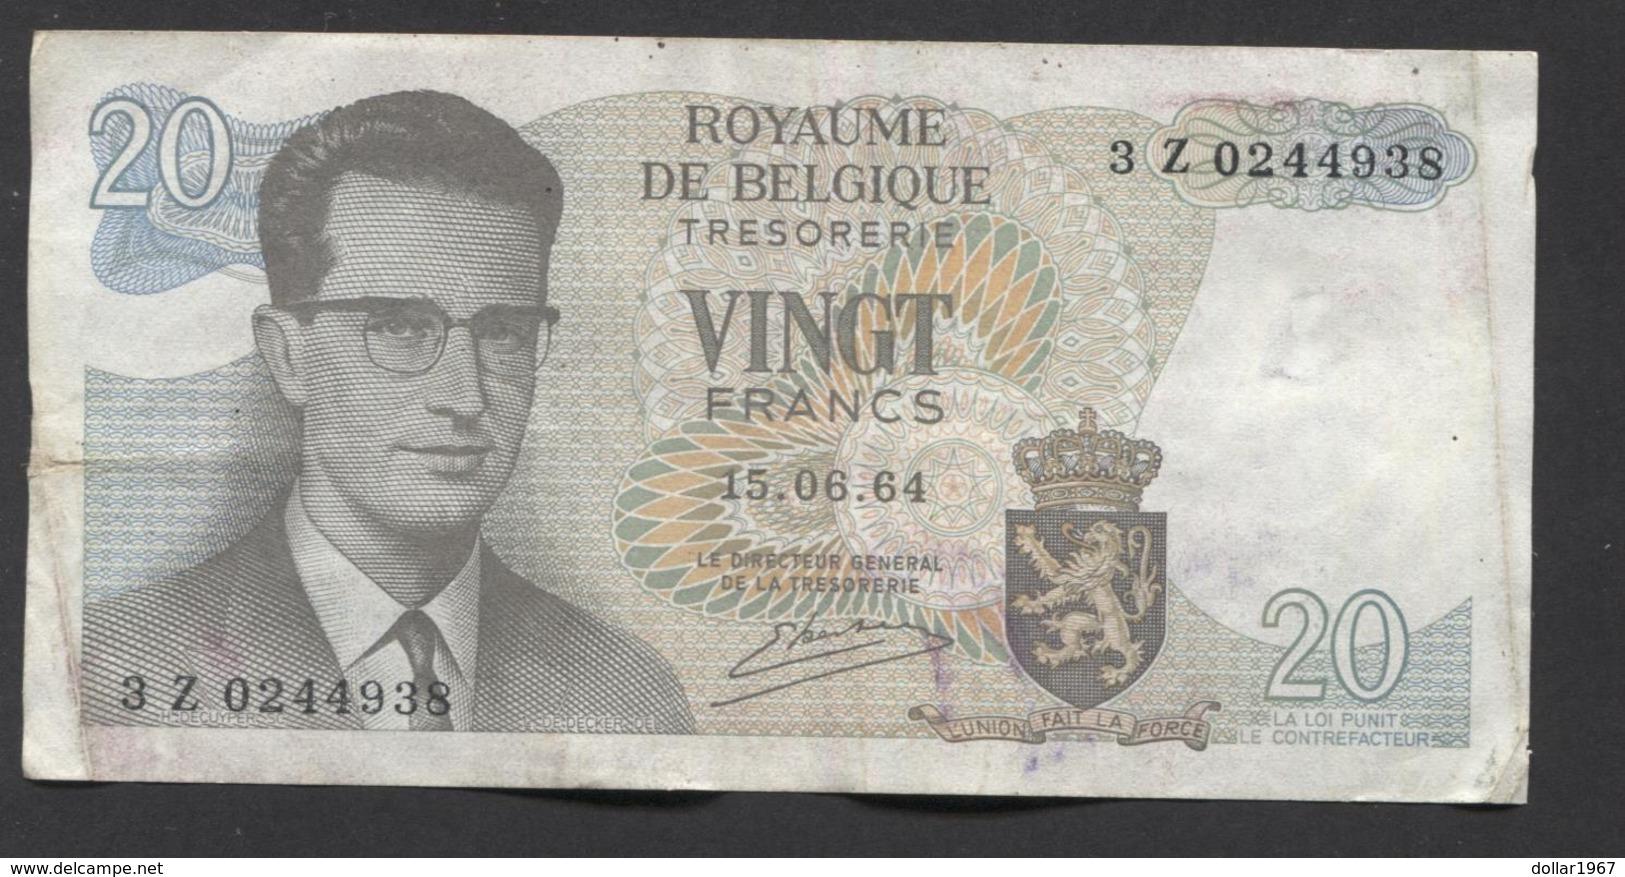 België Belgique Belgium 15 06 1964 -  20 Francs Atomium Baudouin. 3 Z 0244938 - [ 6] Treasury